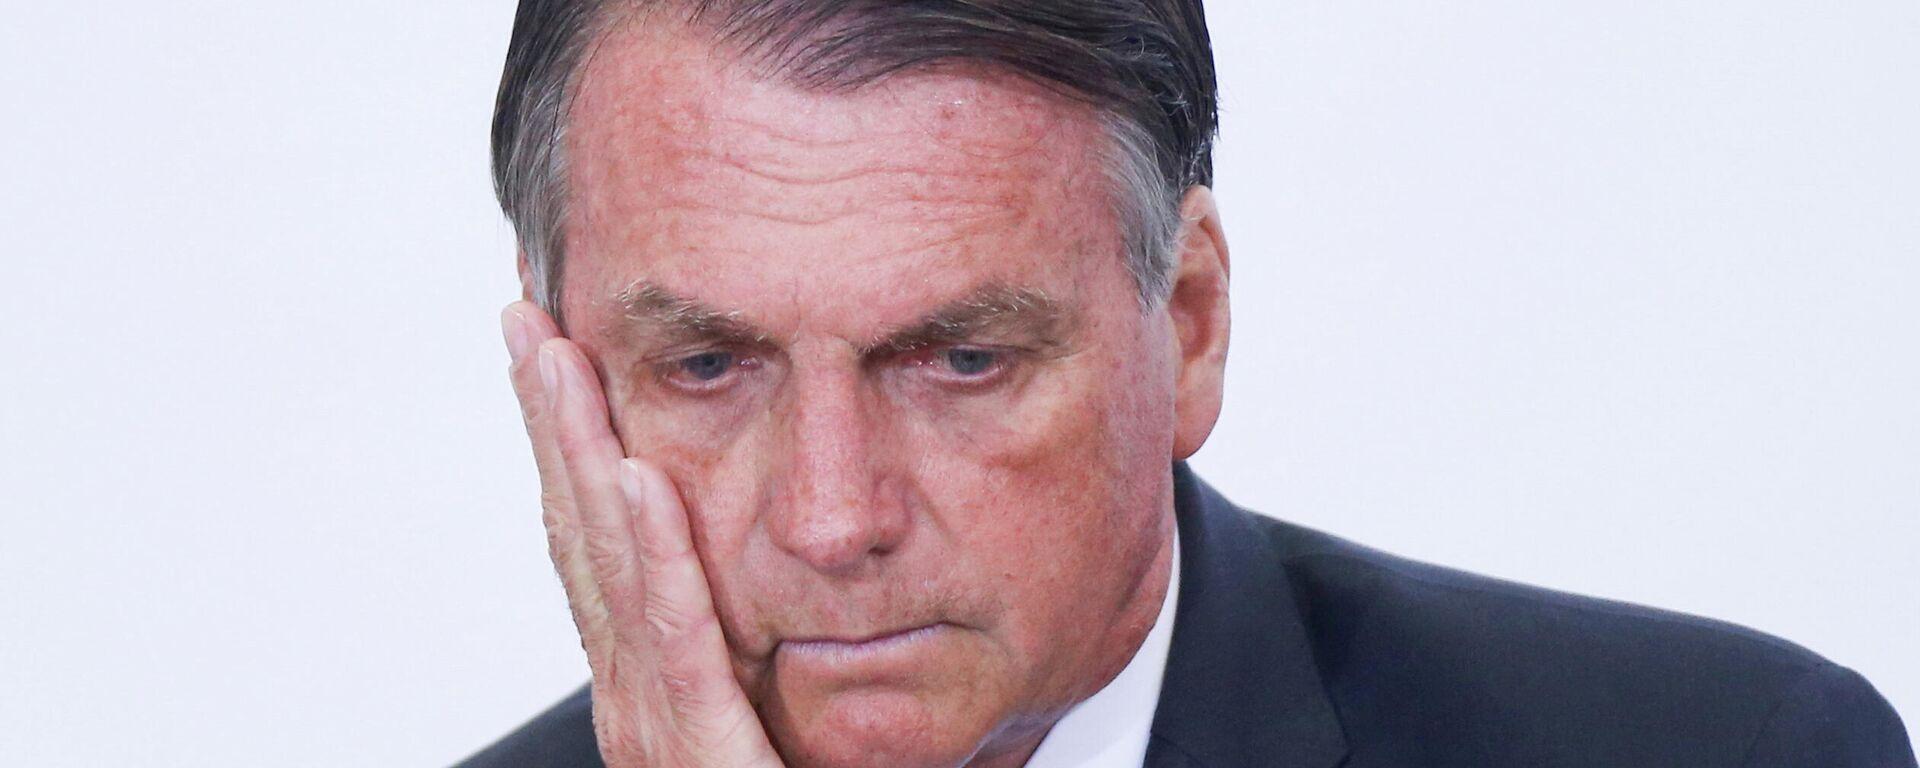 Jair Bolsonaro, presidente de Brasil - Sputnik Mundo, 1920, 06.10.2021